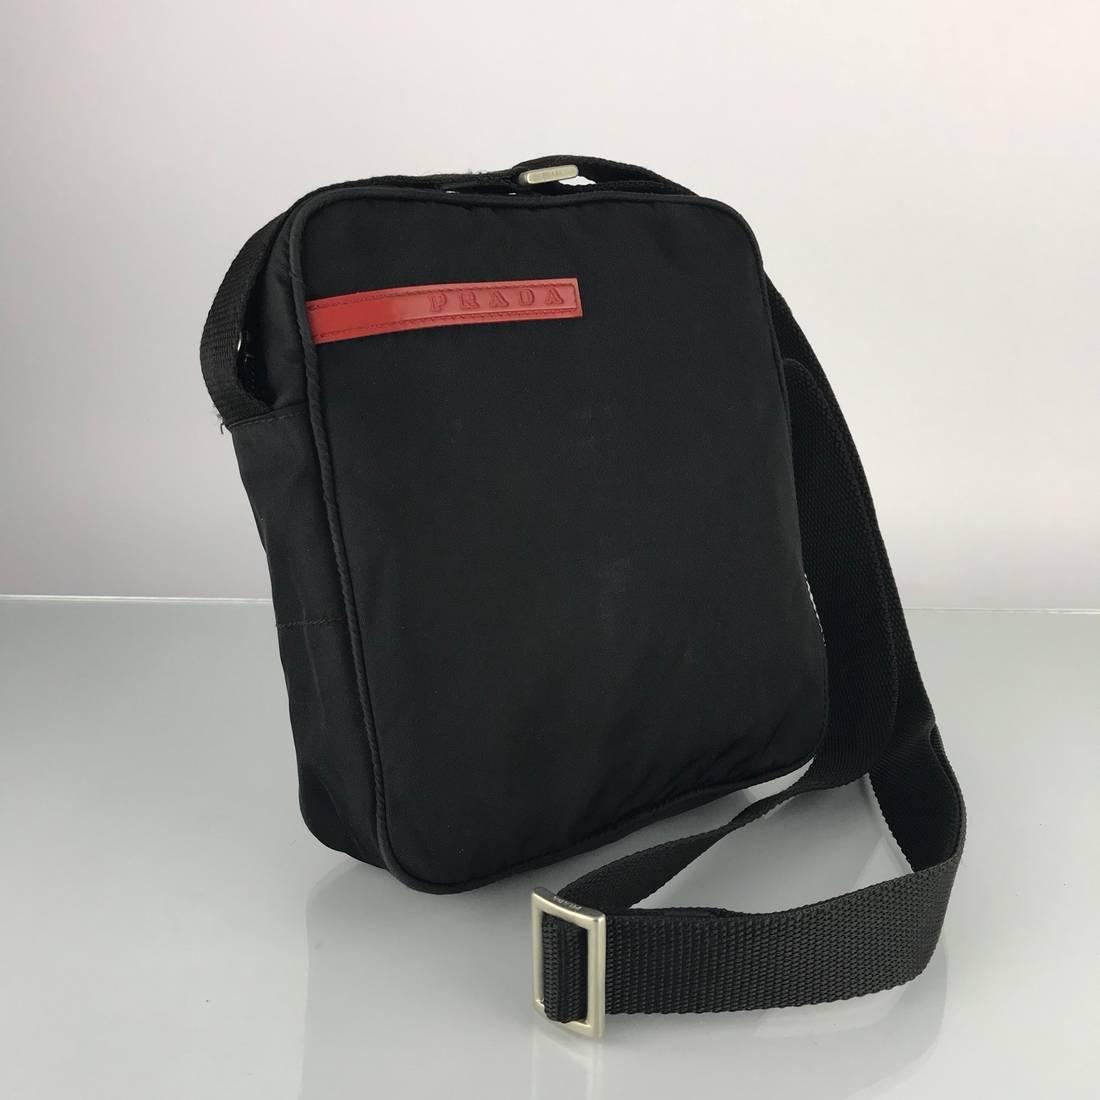 ace6e7b7553 ... low price prada authentic prada sport black nylon crossbody bag size  one size 1 9c951 9c4a4